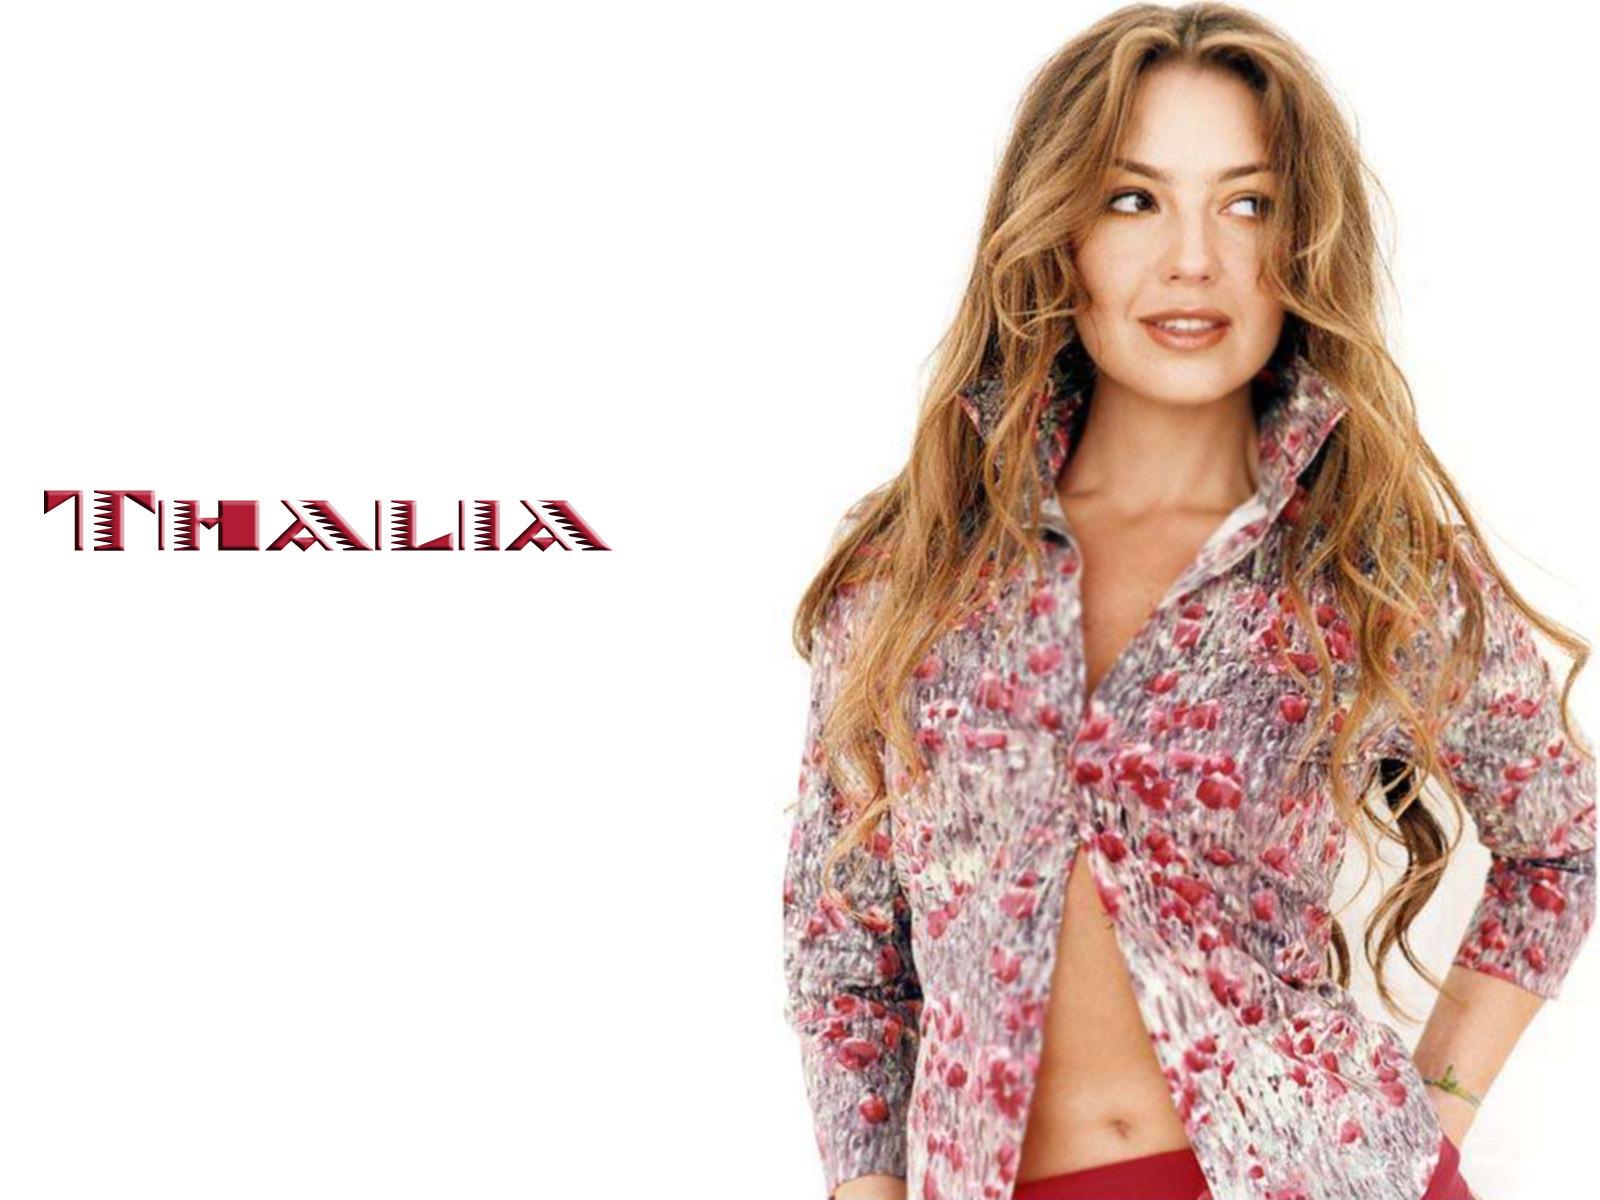 Thalia - Images Actress